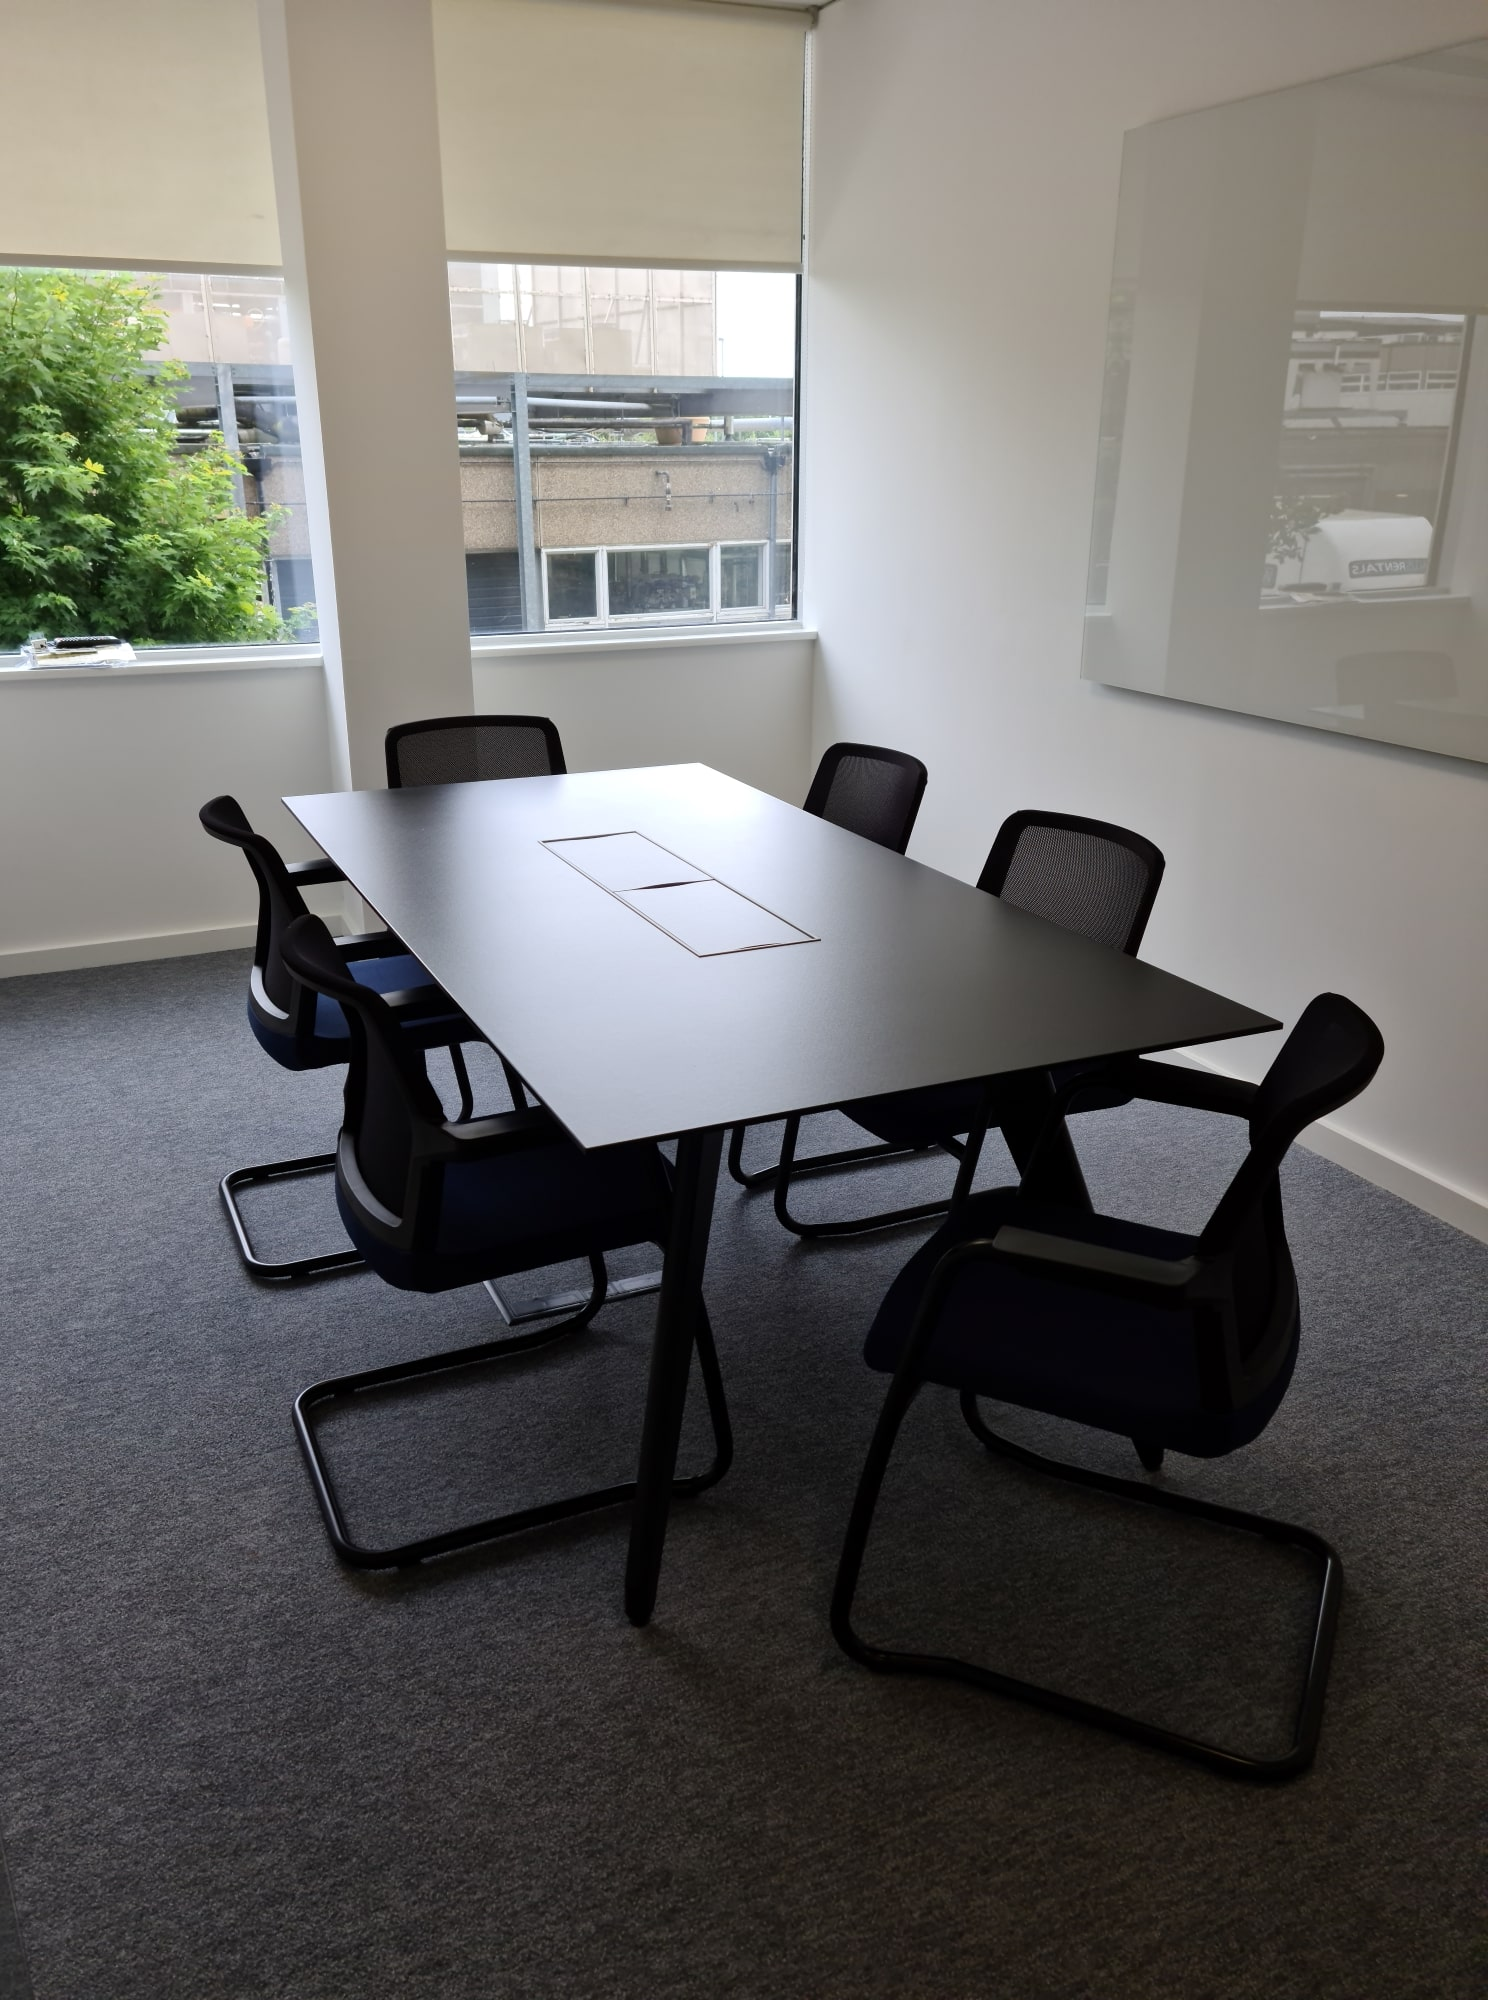 Stylish office furniture